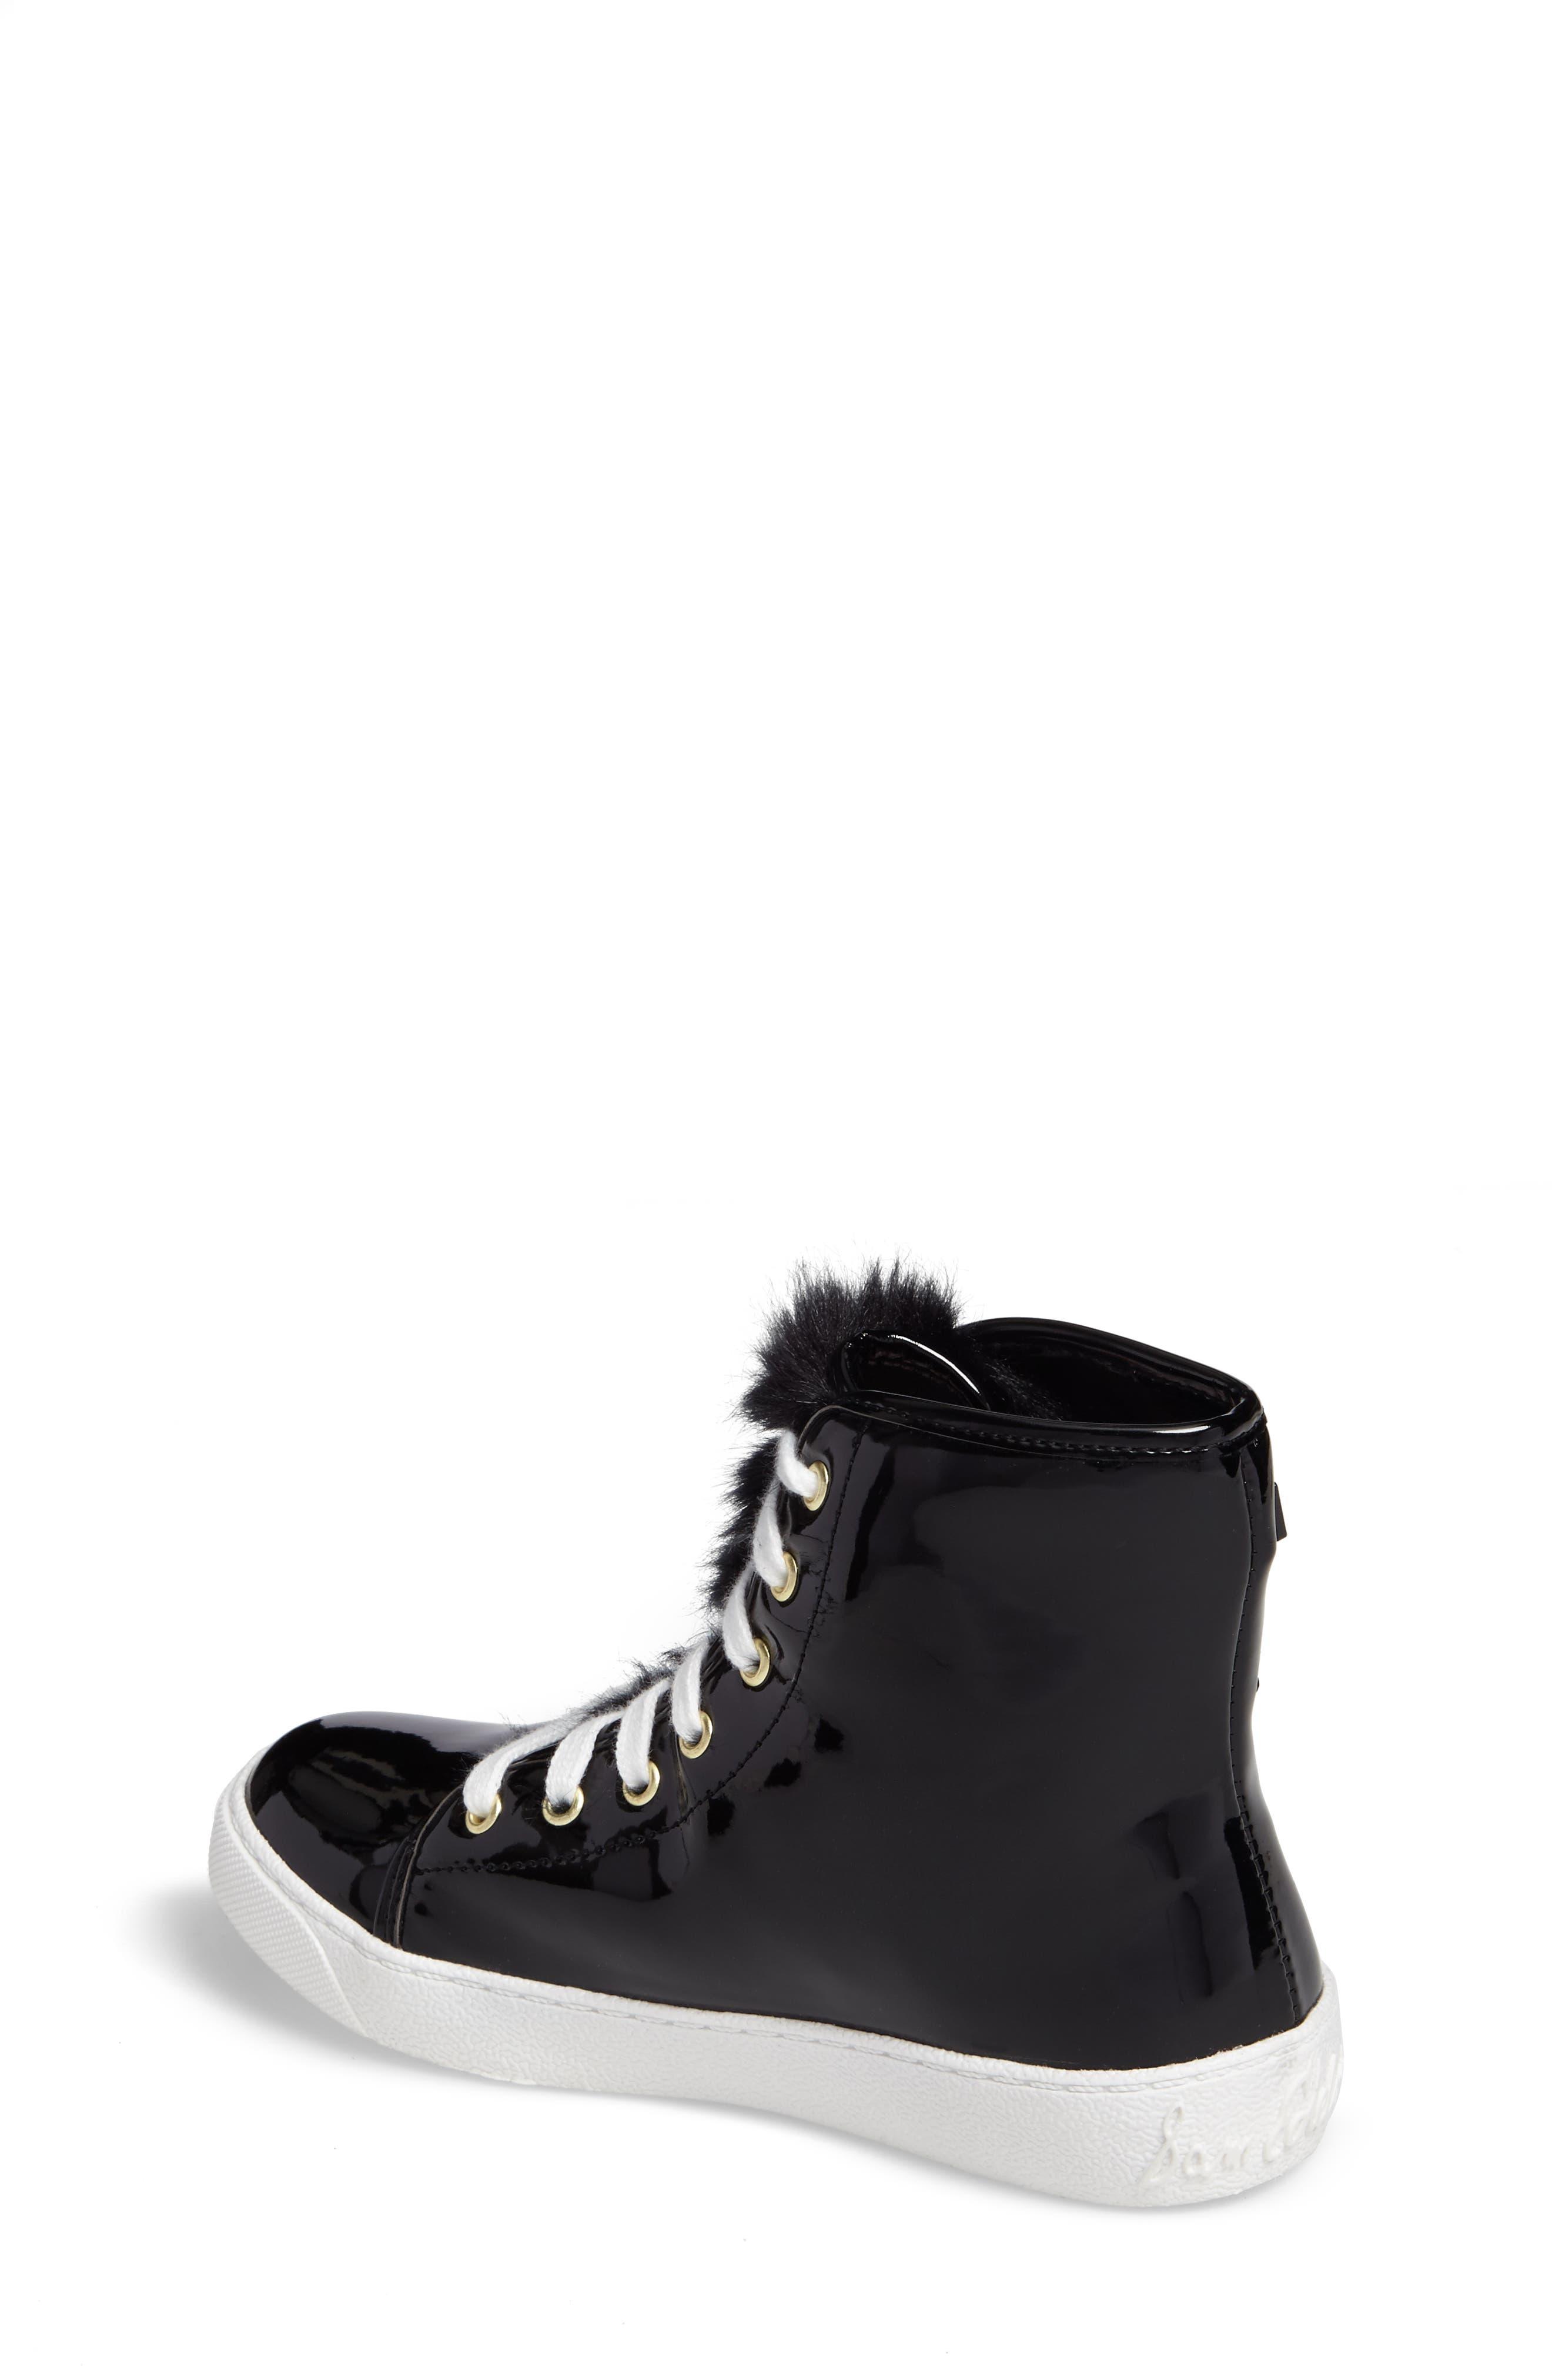 Harriet Heidi High-Top Sneaker,                             Alternate thumbnail 2, color,                             001